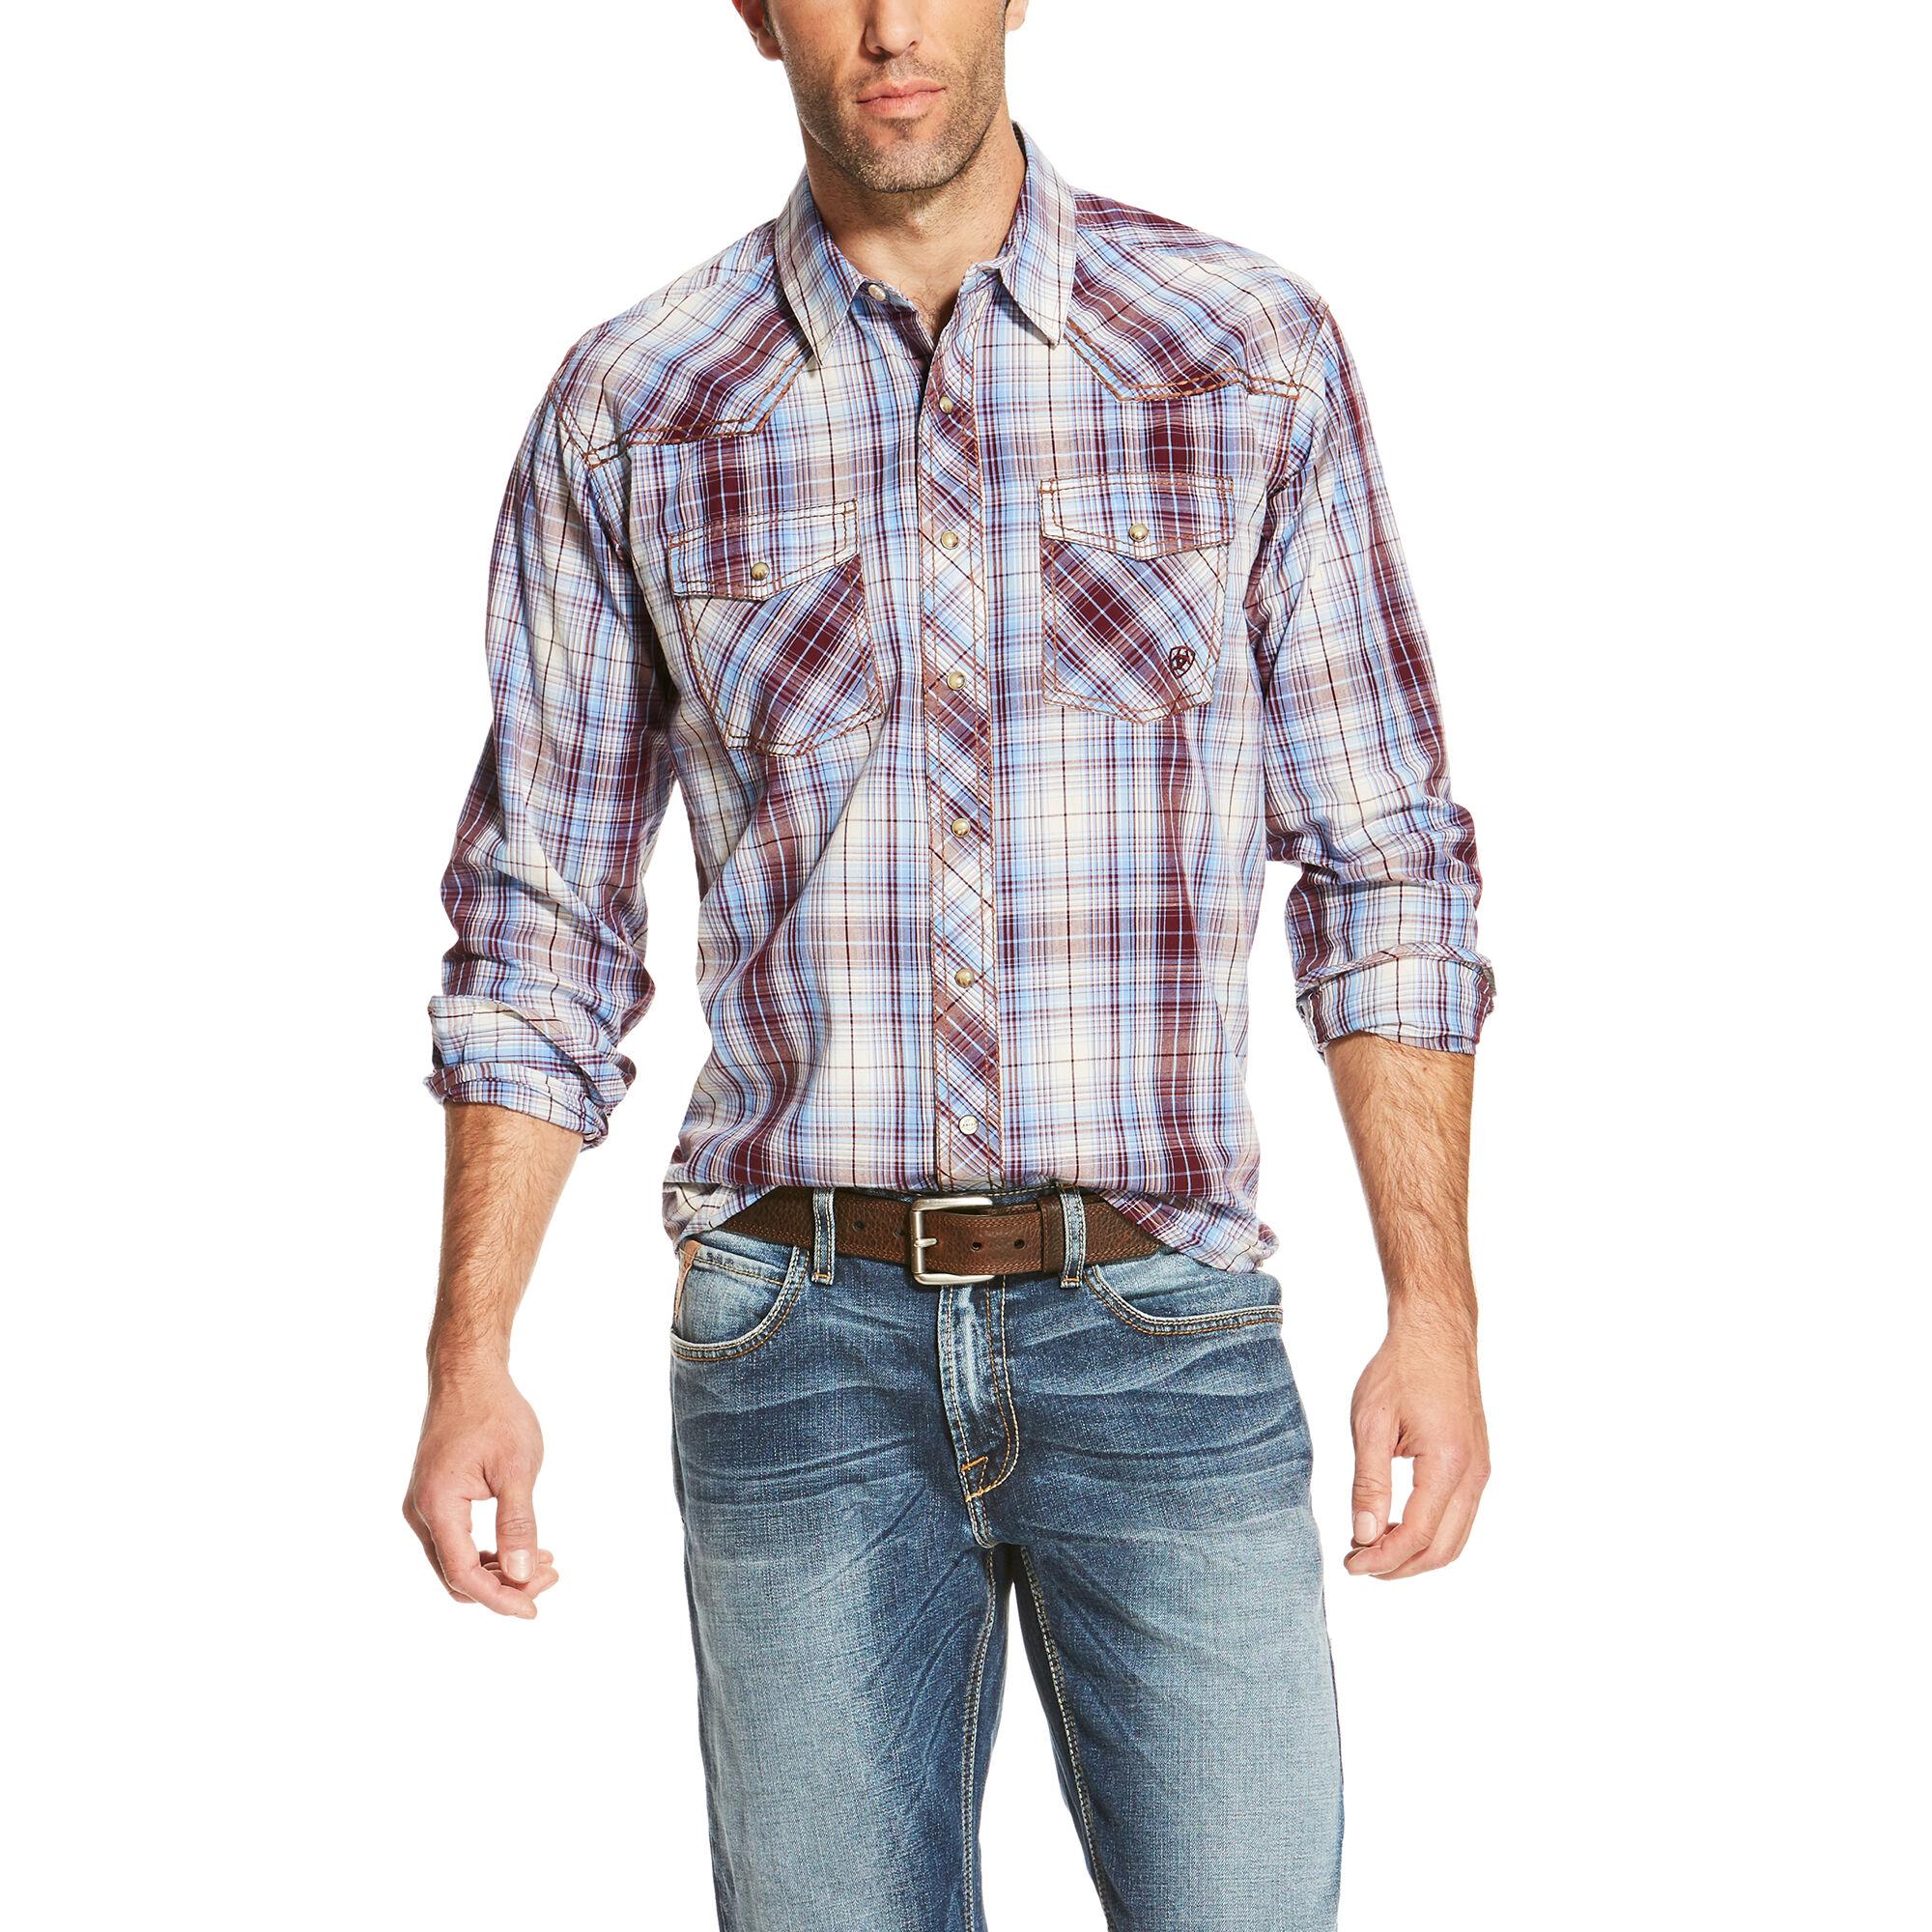 Ulmar Retro Shirt